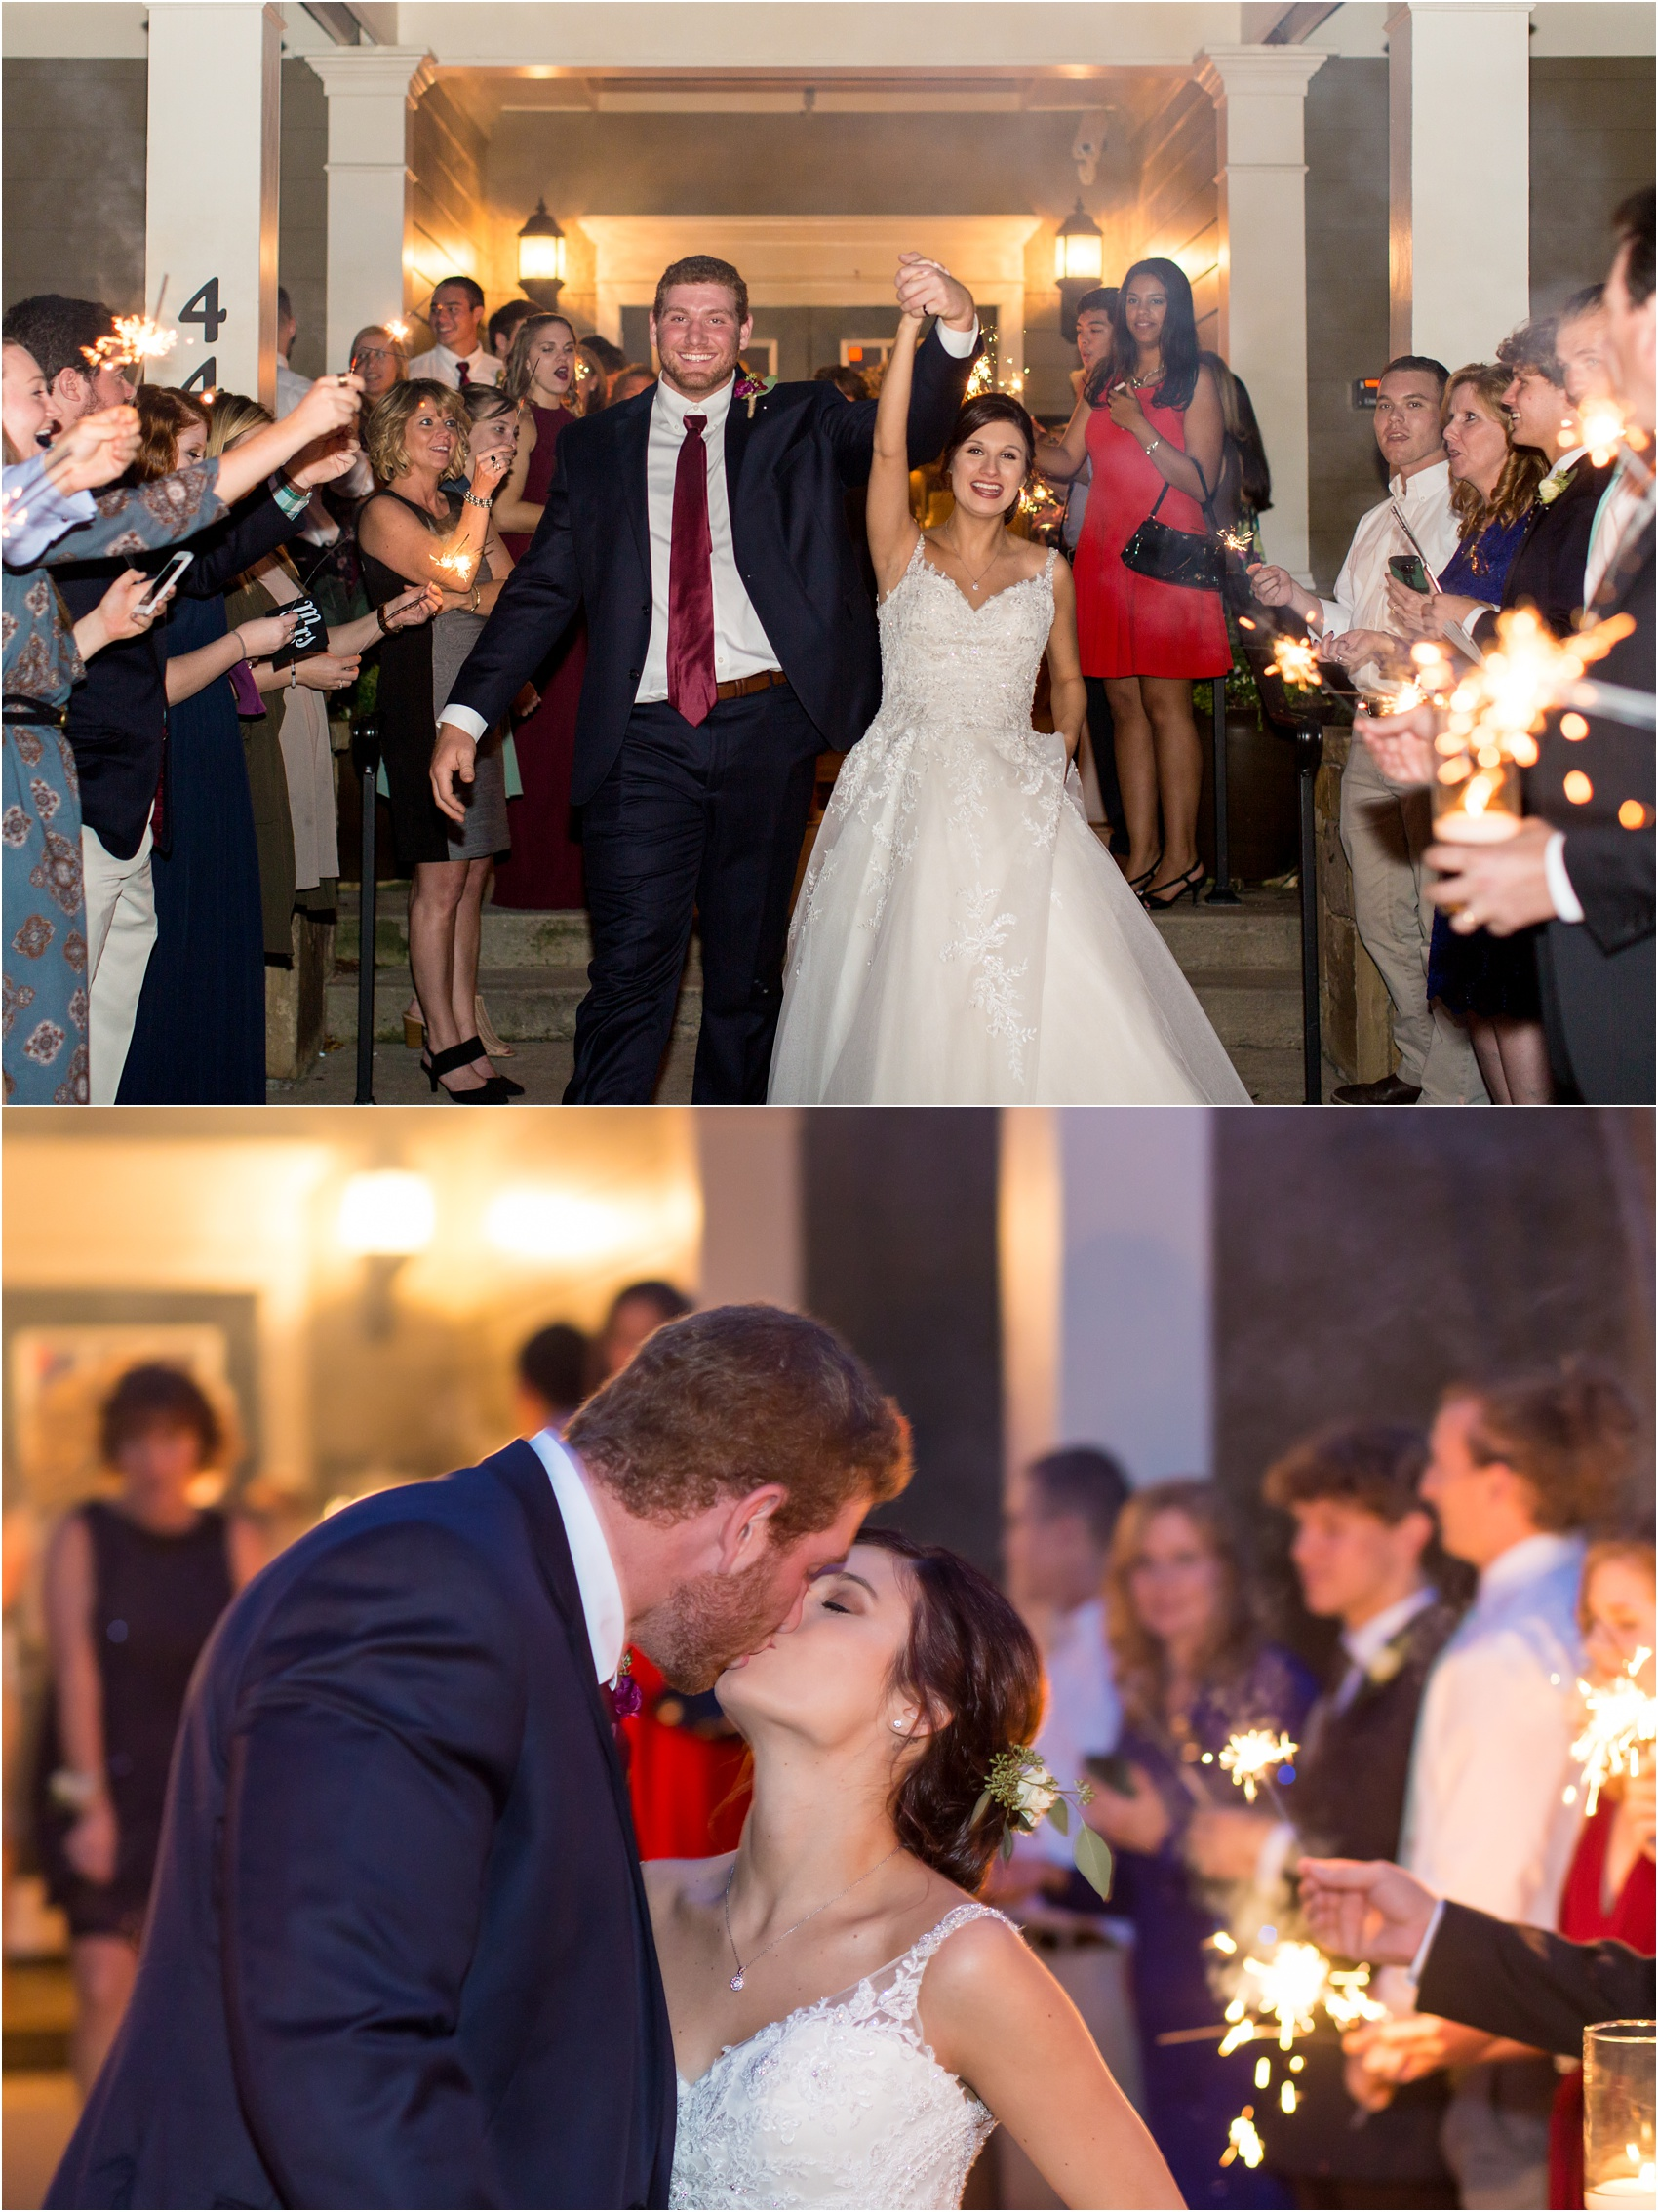 Savannah Eve Photography- May Wedding- Blog-52.jpg